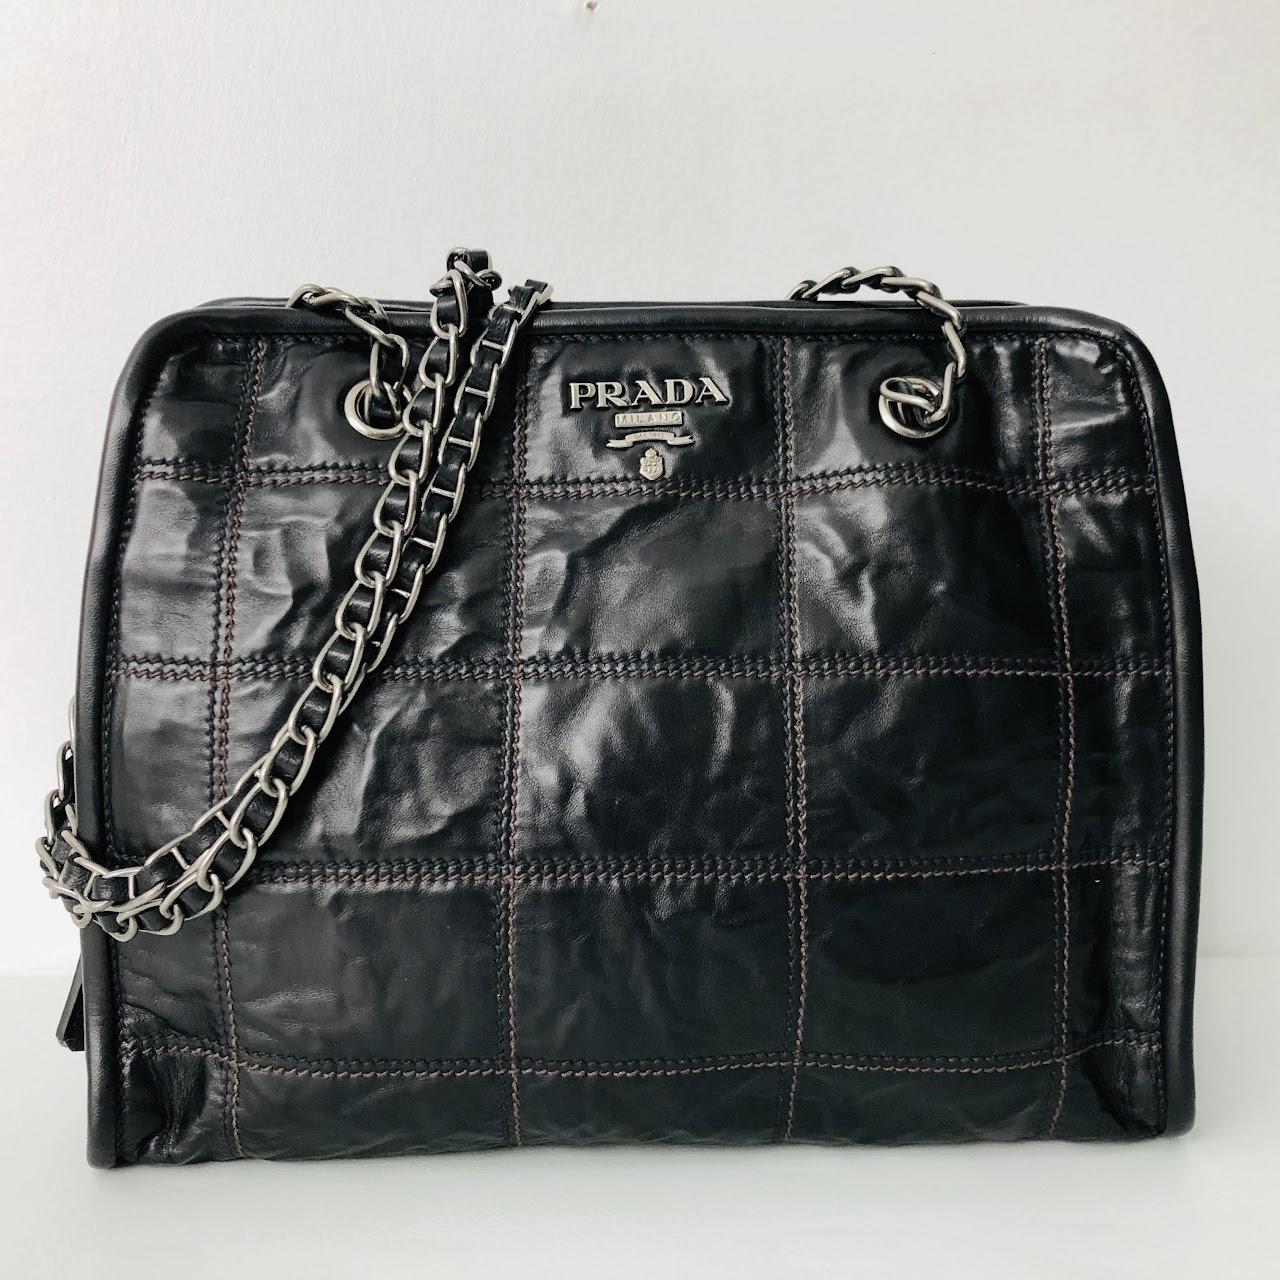 f81c9befad5e Prada Quilted Leather Shoulder Bag | Shophousingworks